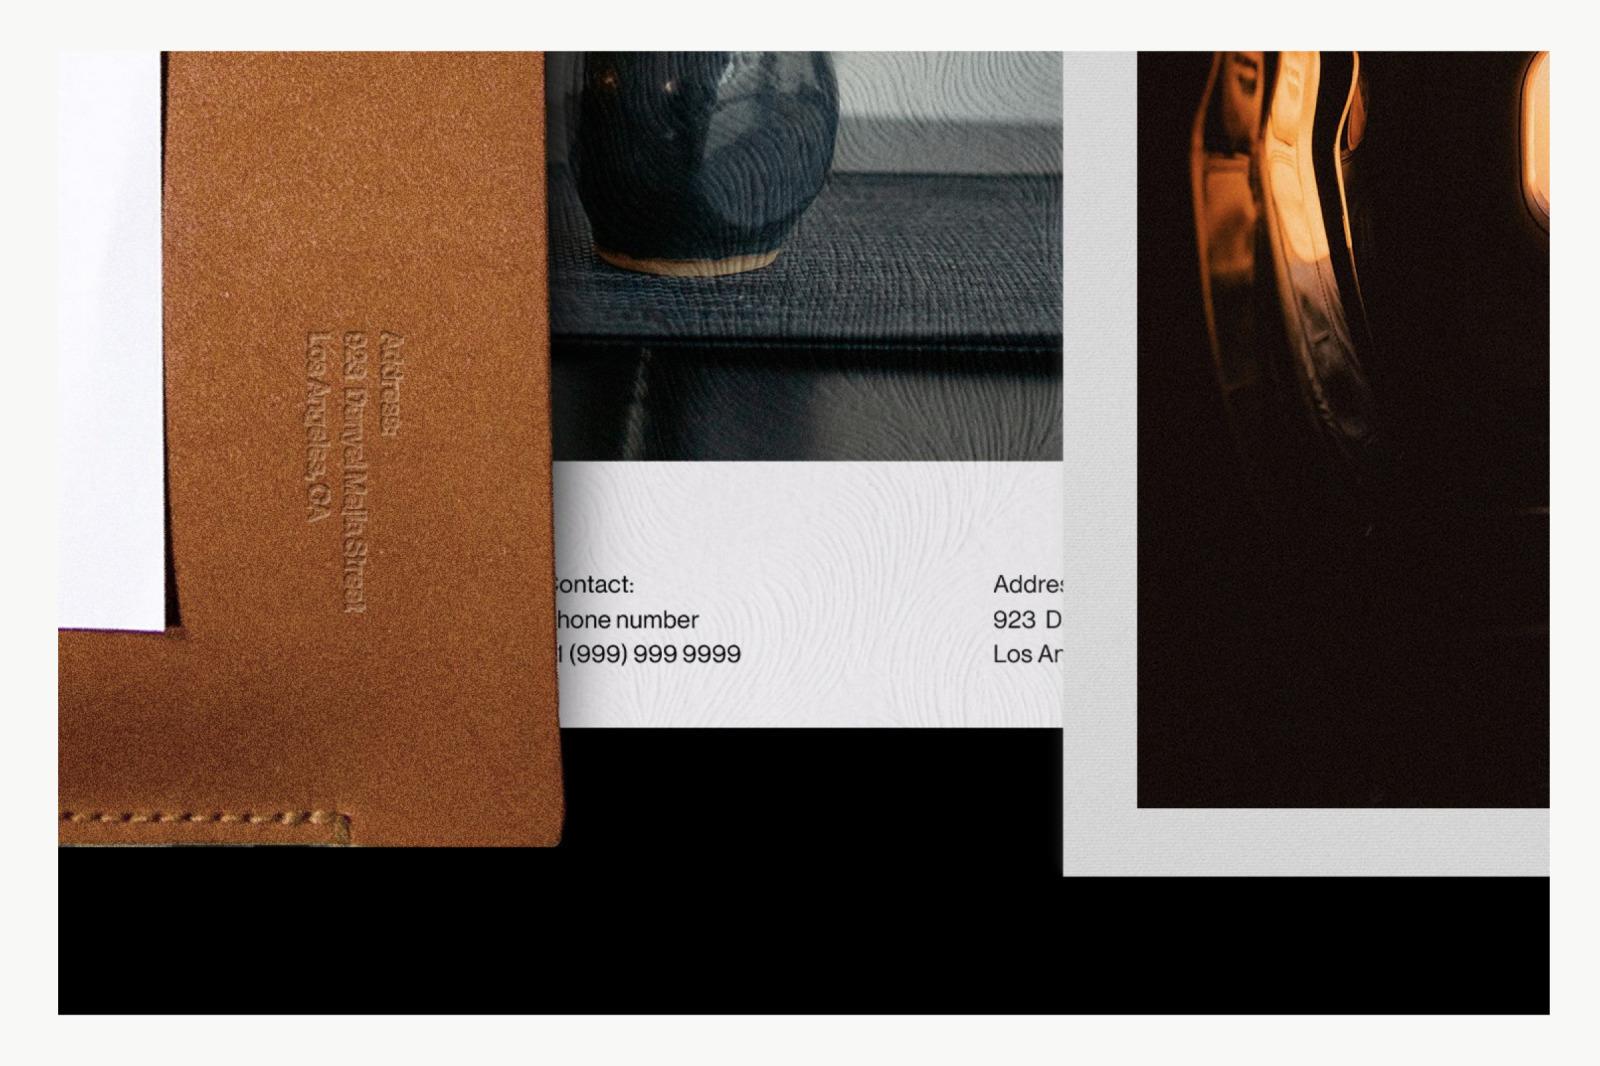 (Leather) Stationery Branding Mockup